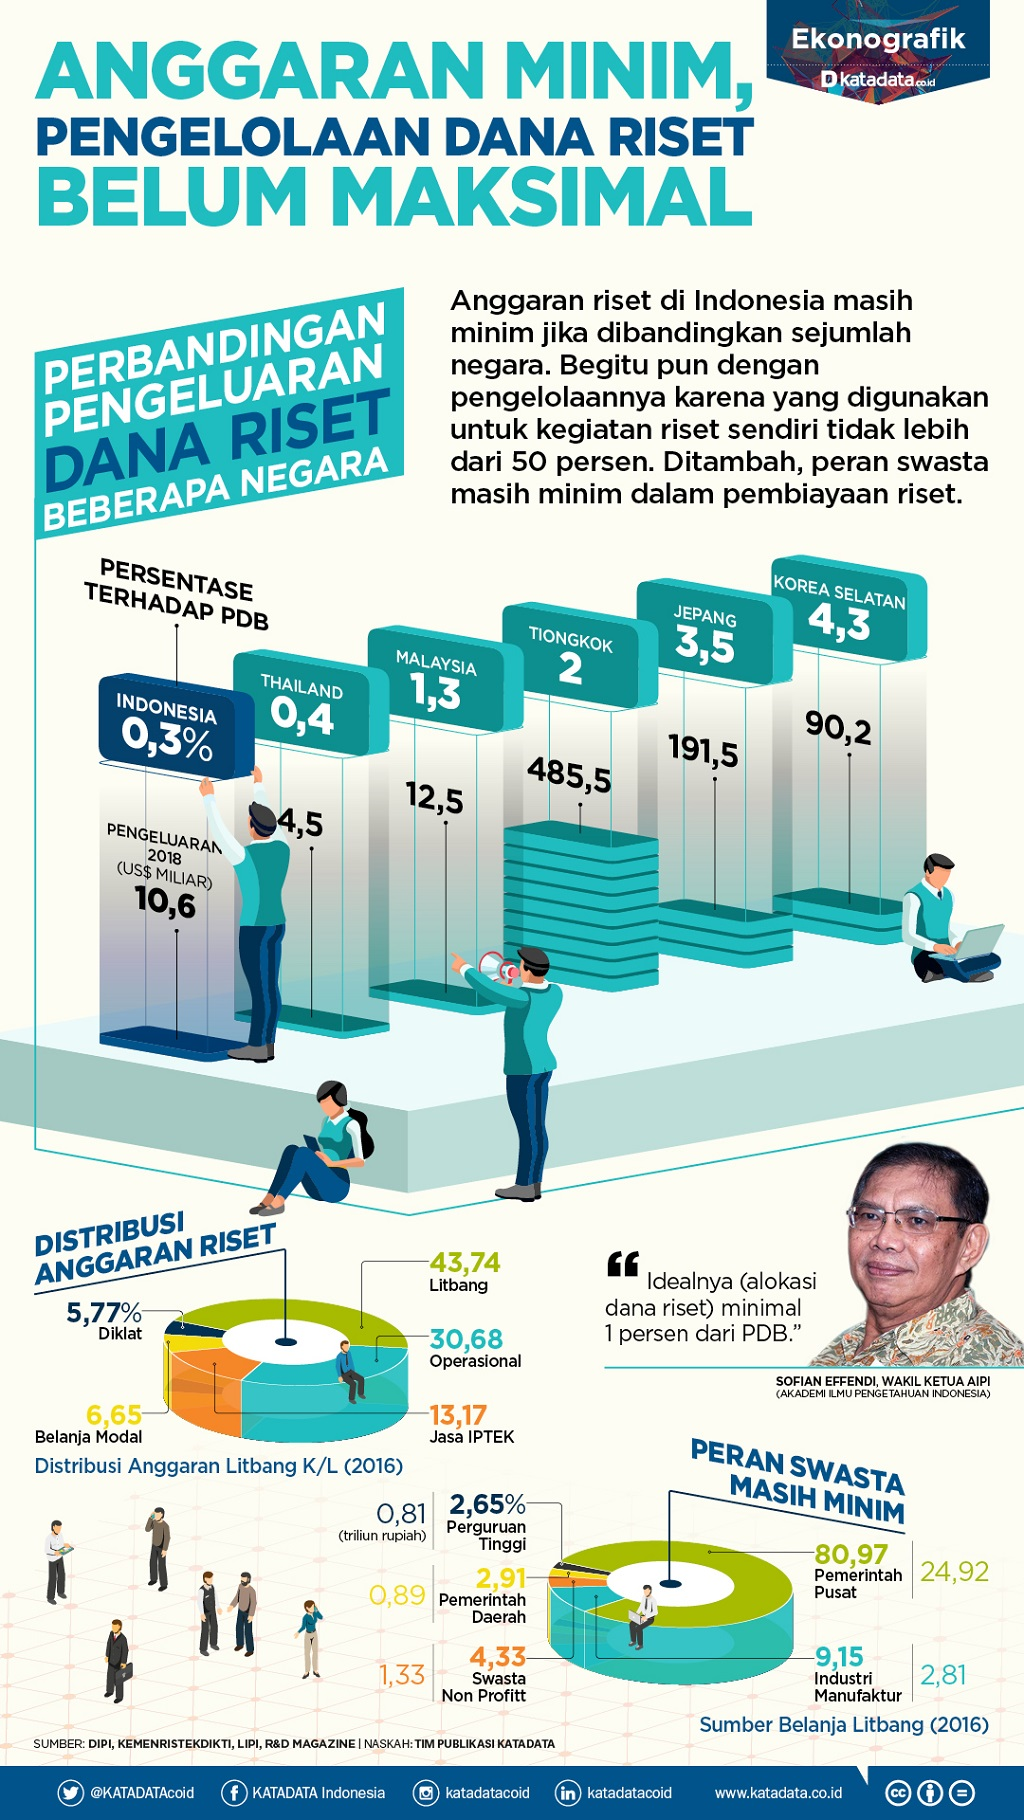 FA_Anggaran Riset Minim